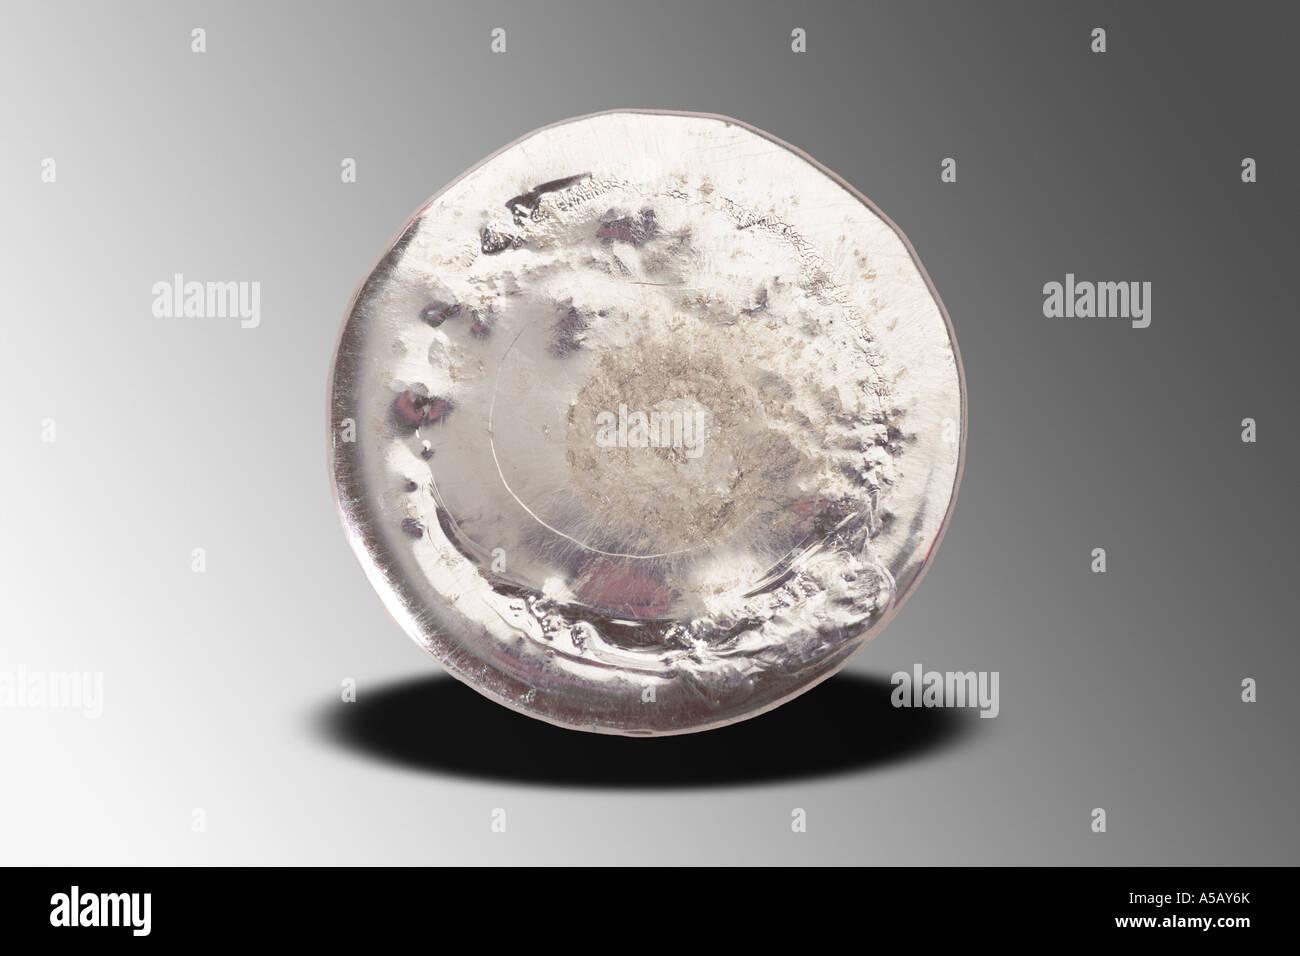 Elemental Tin - Stock Image